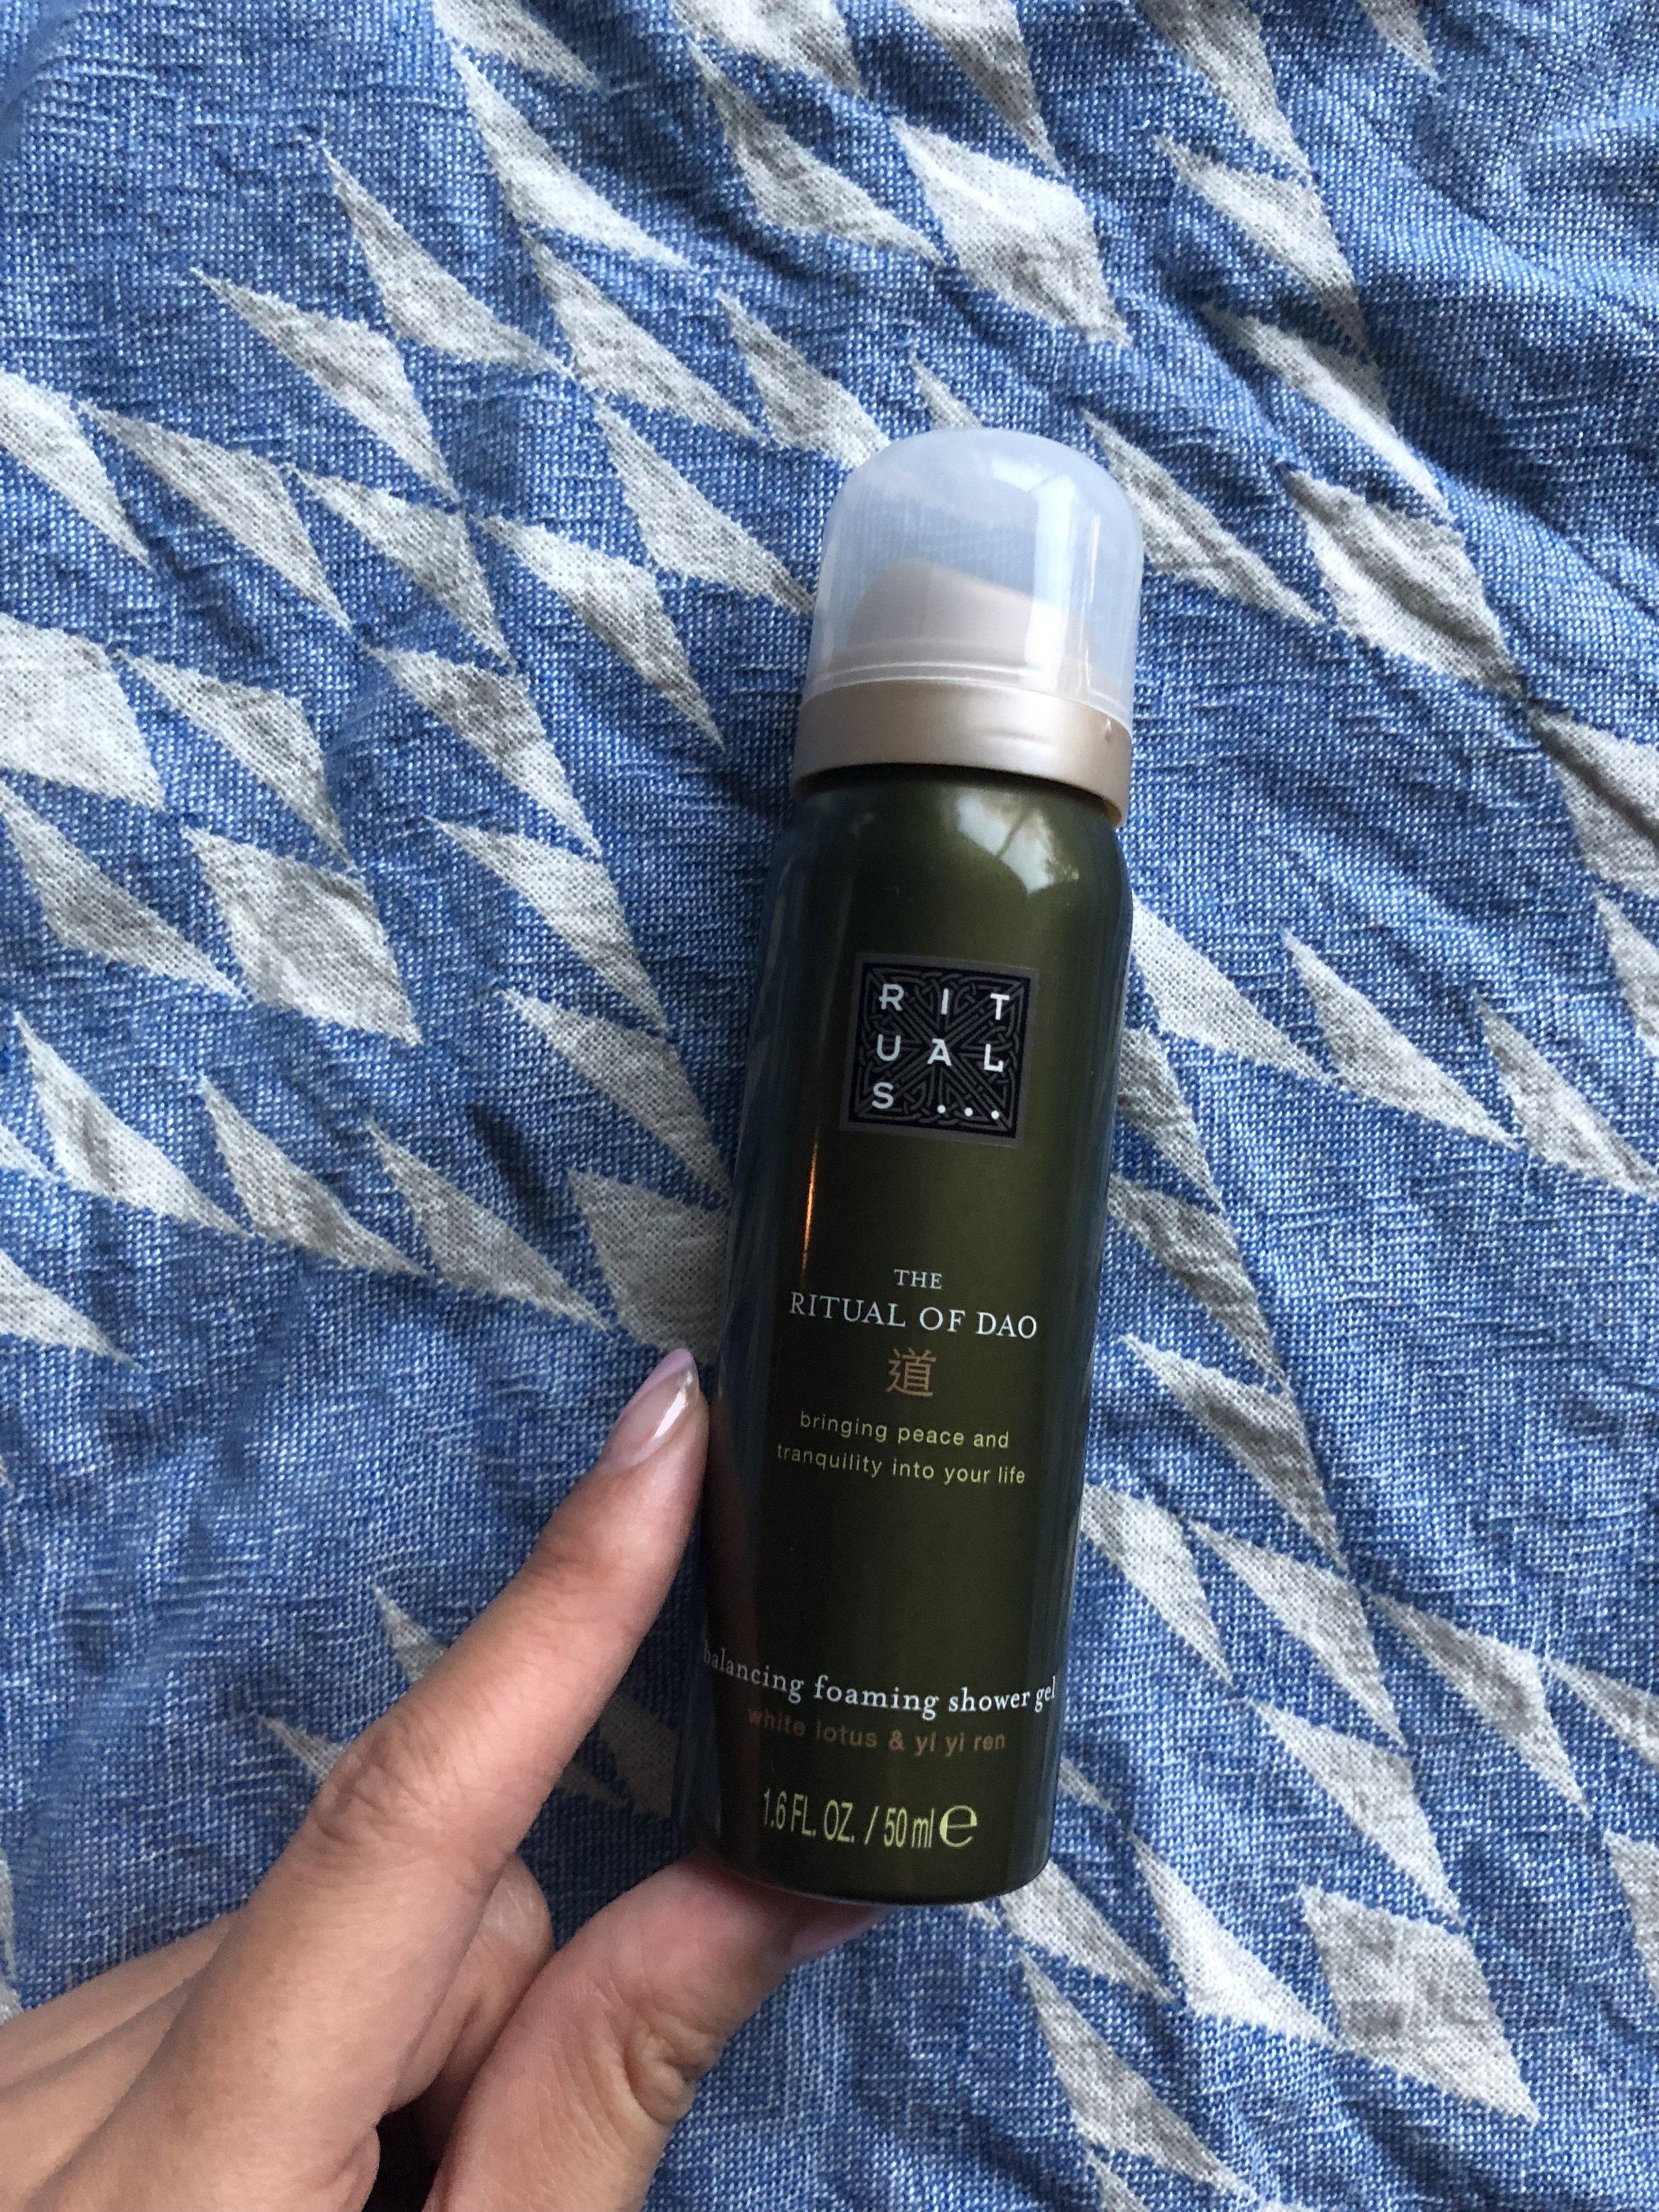 Rituals: Foaming Shower Gel - Full-Size $15